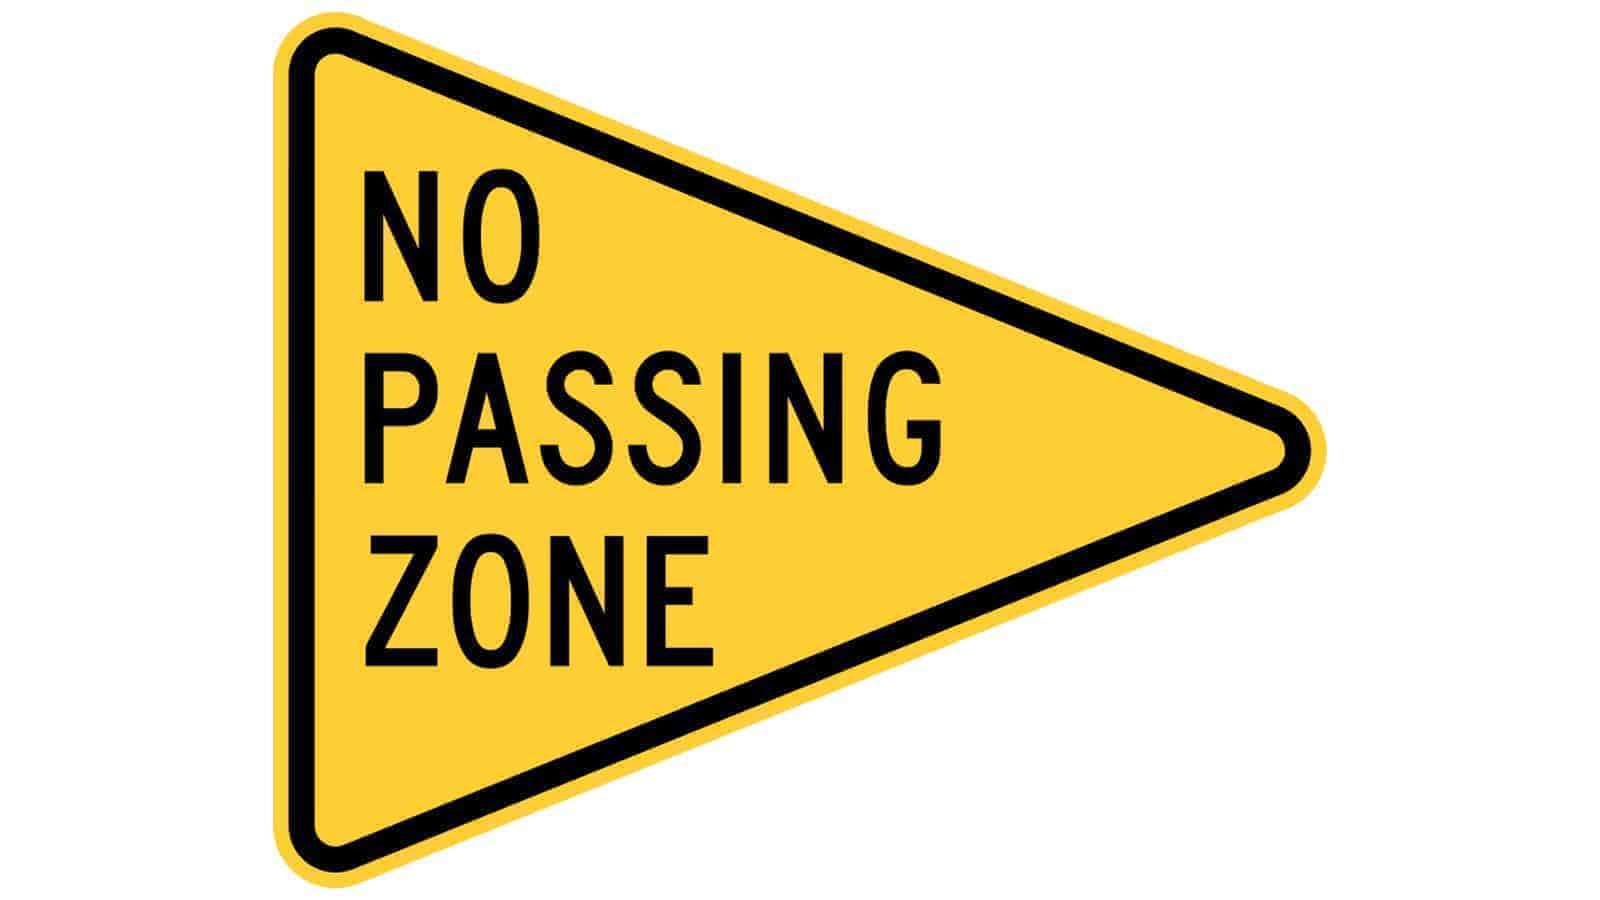 Warning sign No Passing Zone